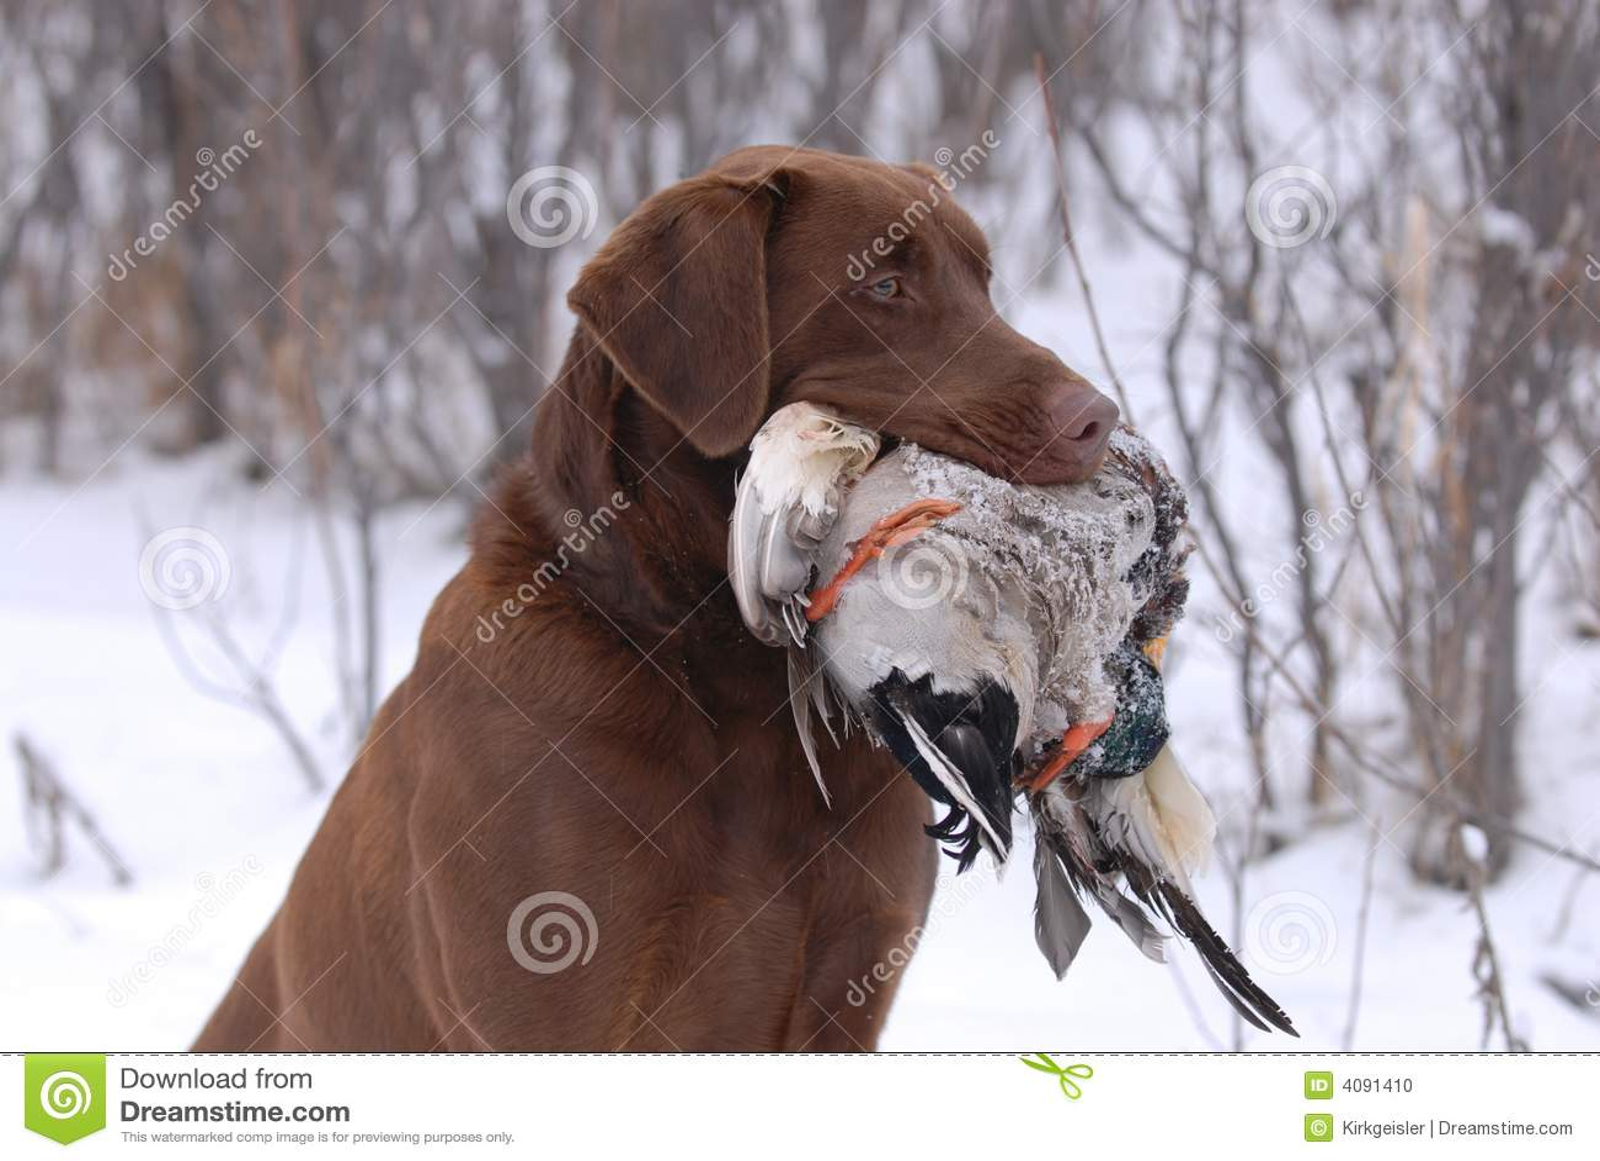 Jagdbegleiter